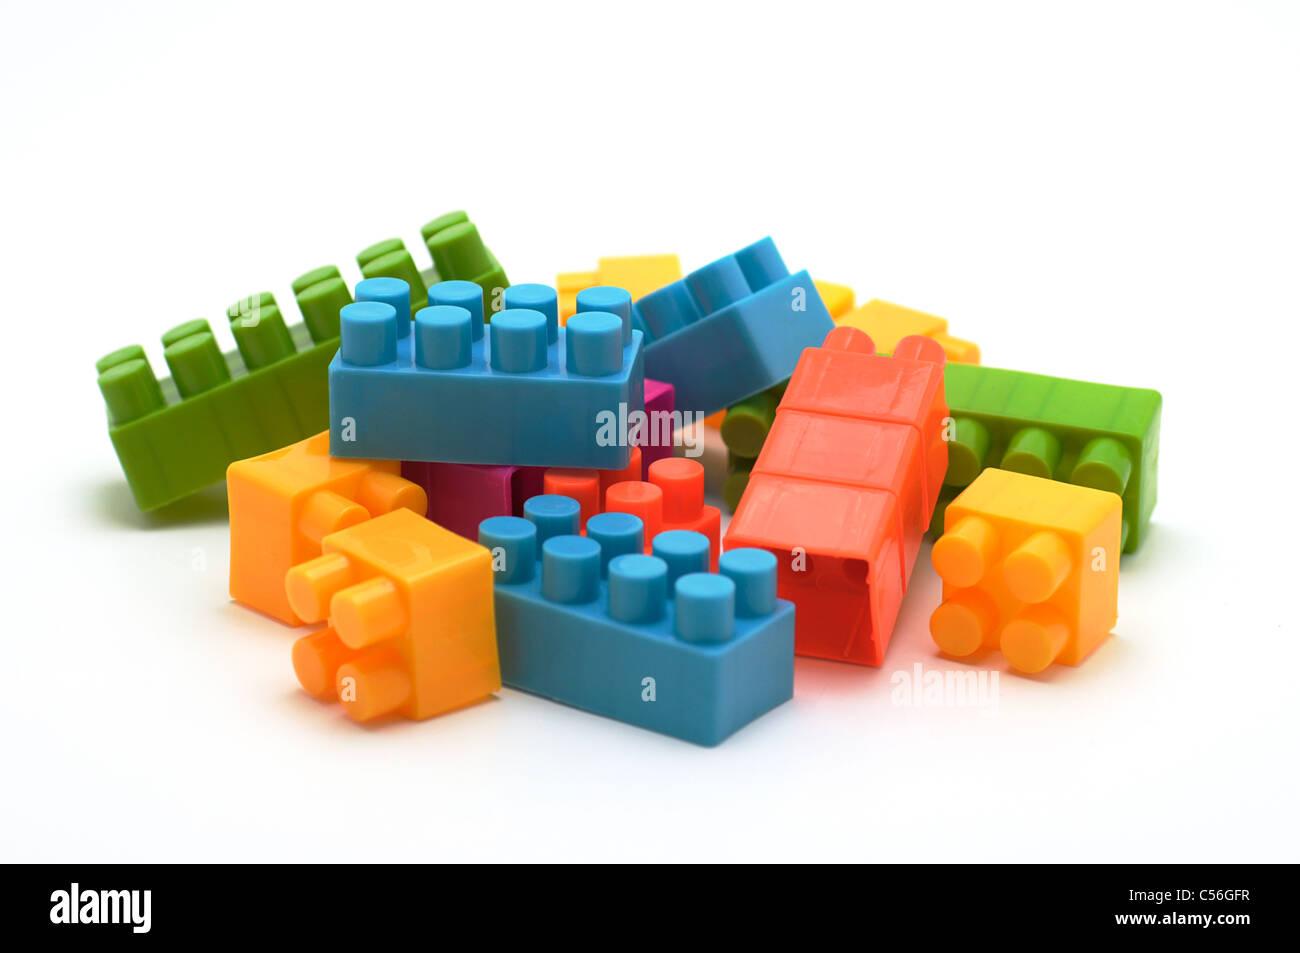 Building Blocks, Plastic - Stock Image